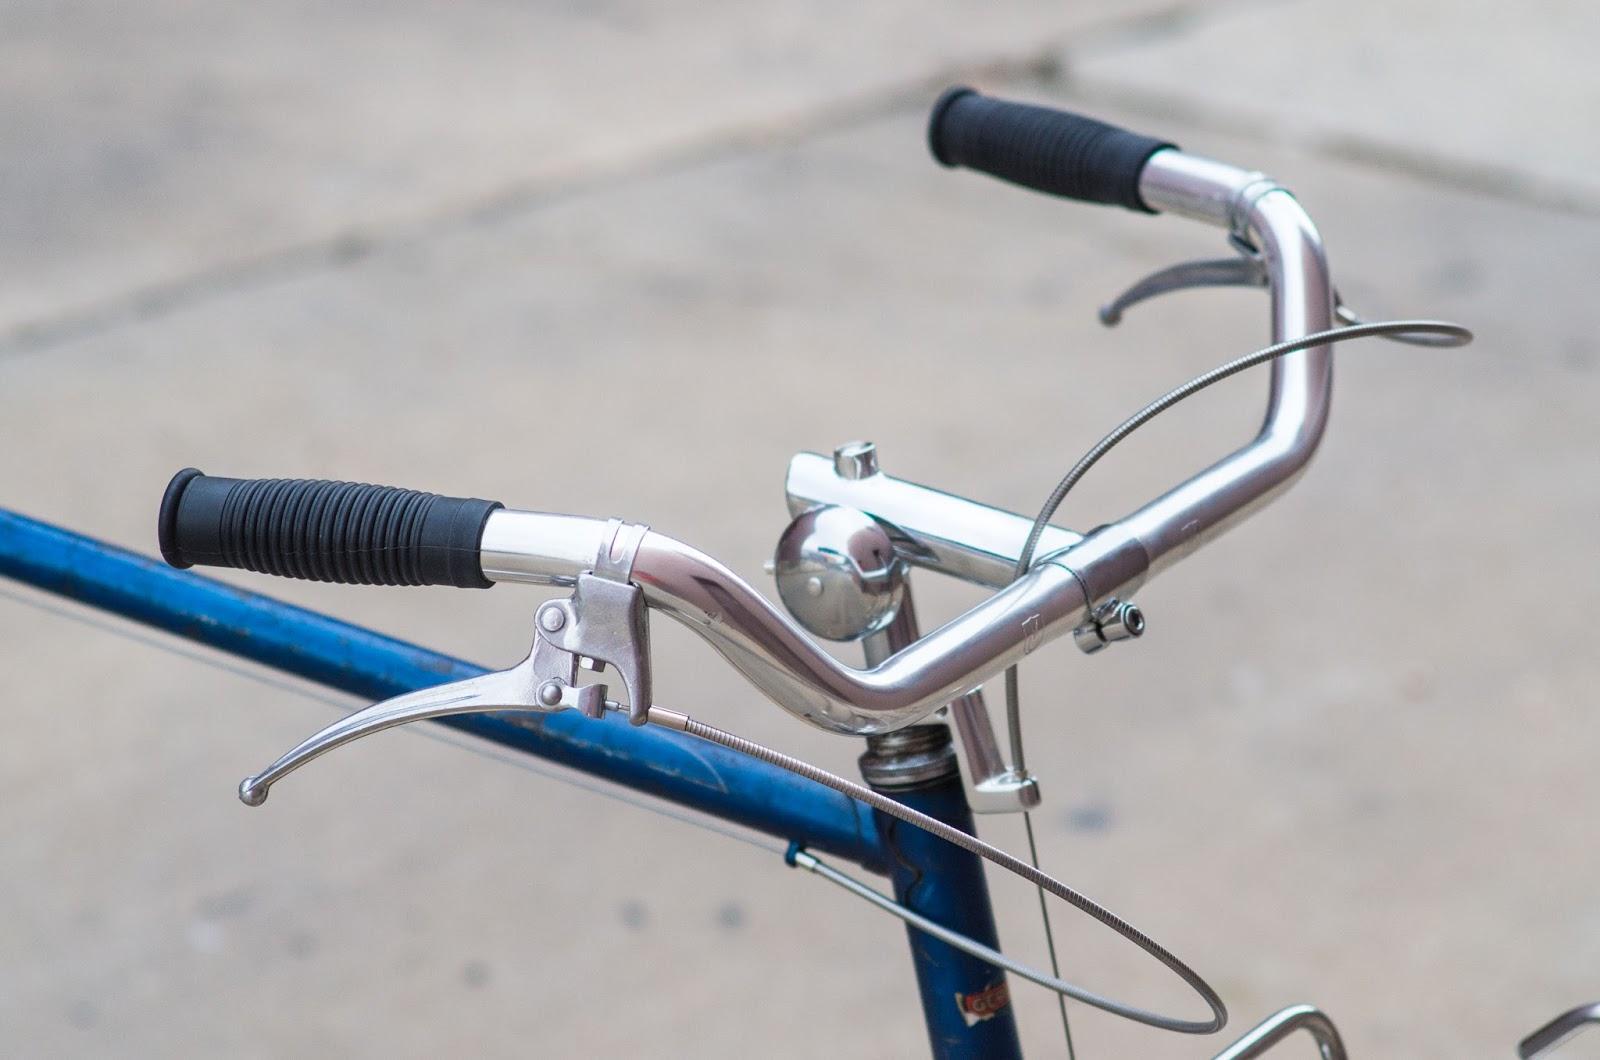 MTB Road Bike Handlebar Handle Bar Bicycle Brake Levers Handles 22.2mm ycling